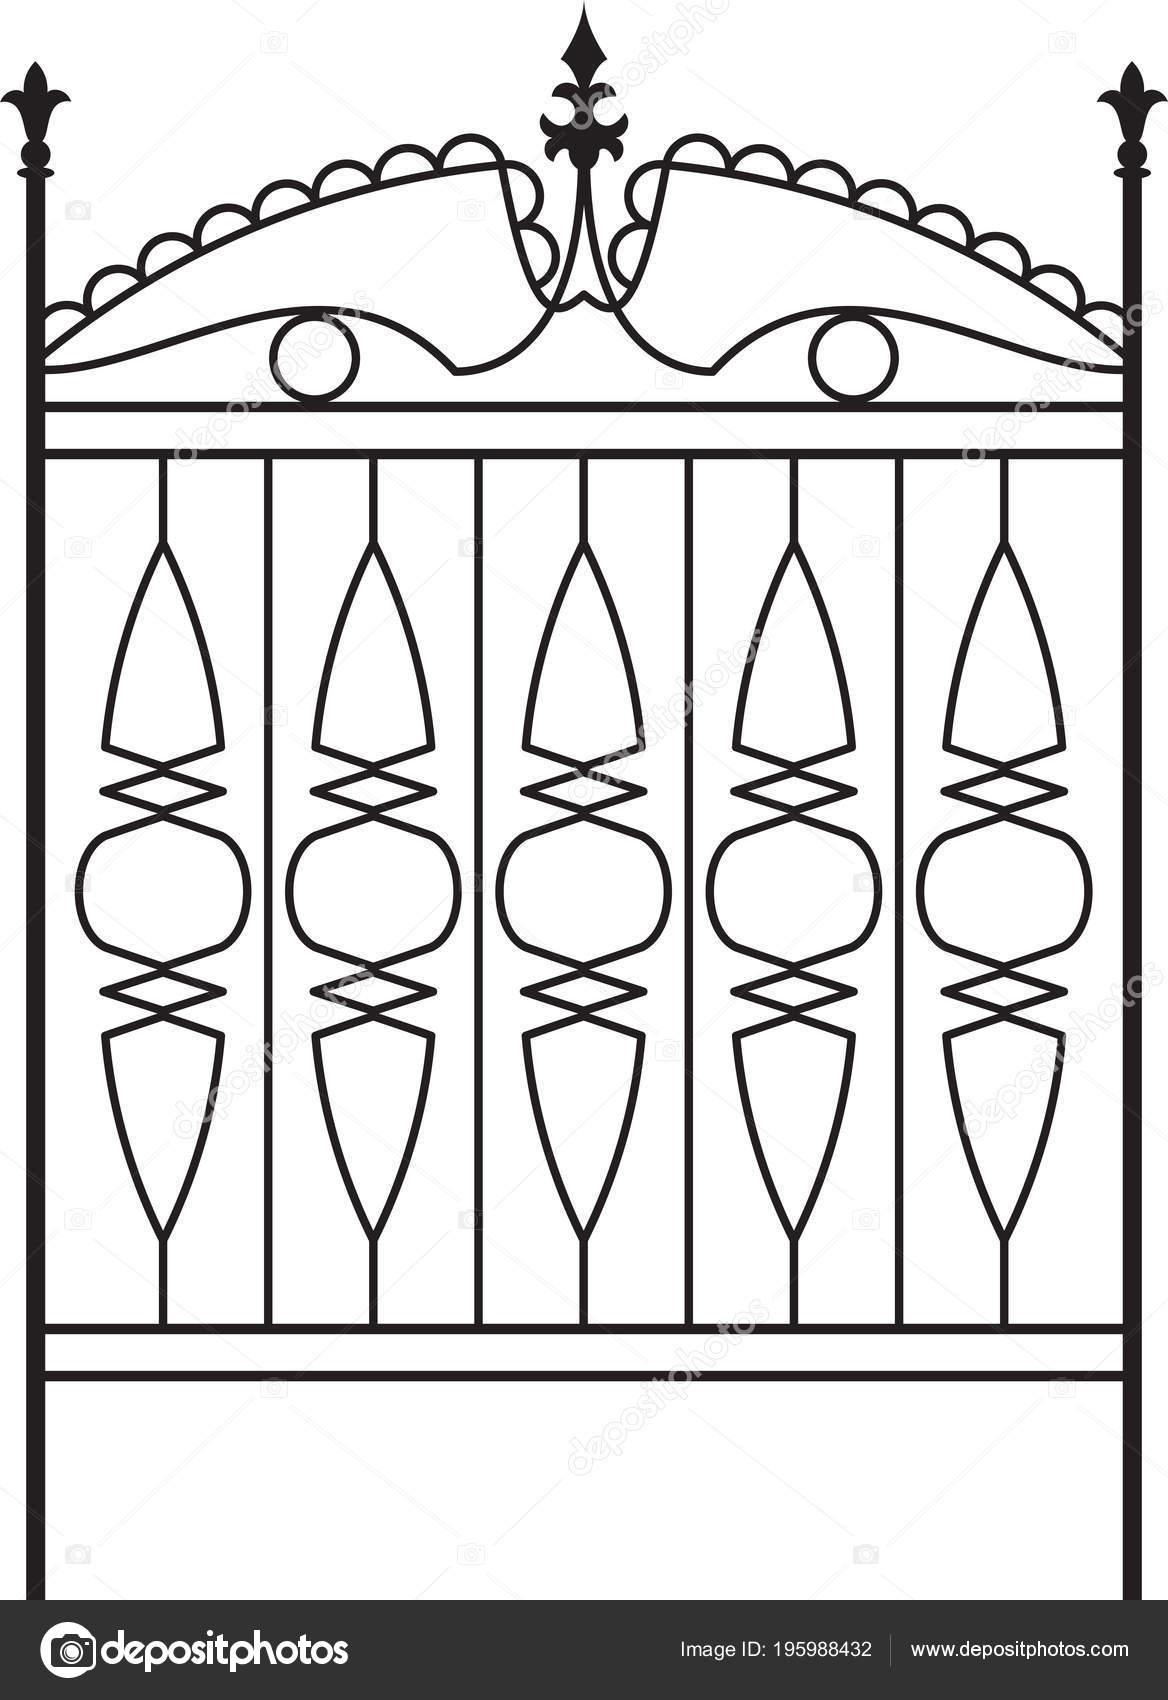 Portail fer forg cl ture porte fen tre grille garde corps design image vectorielle for Design fer forge fenetre